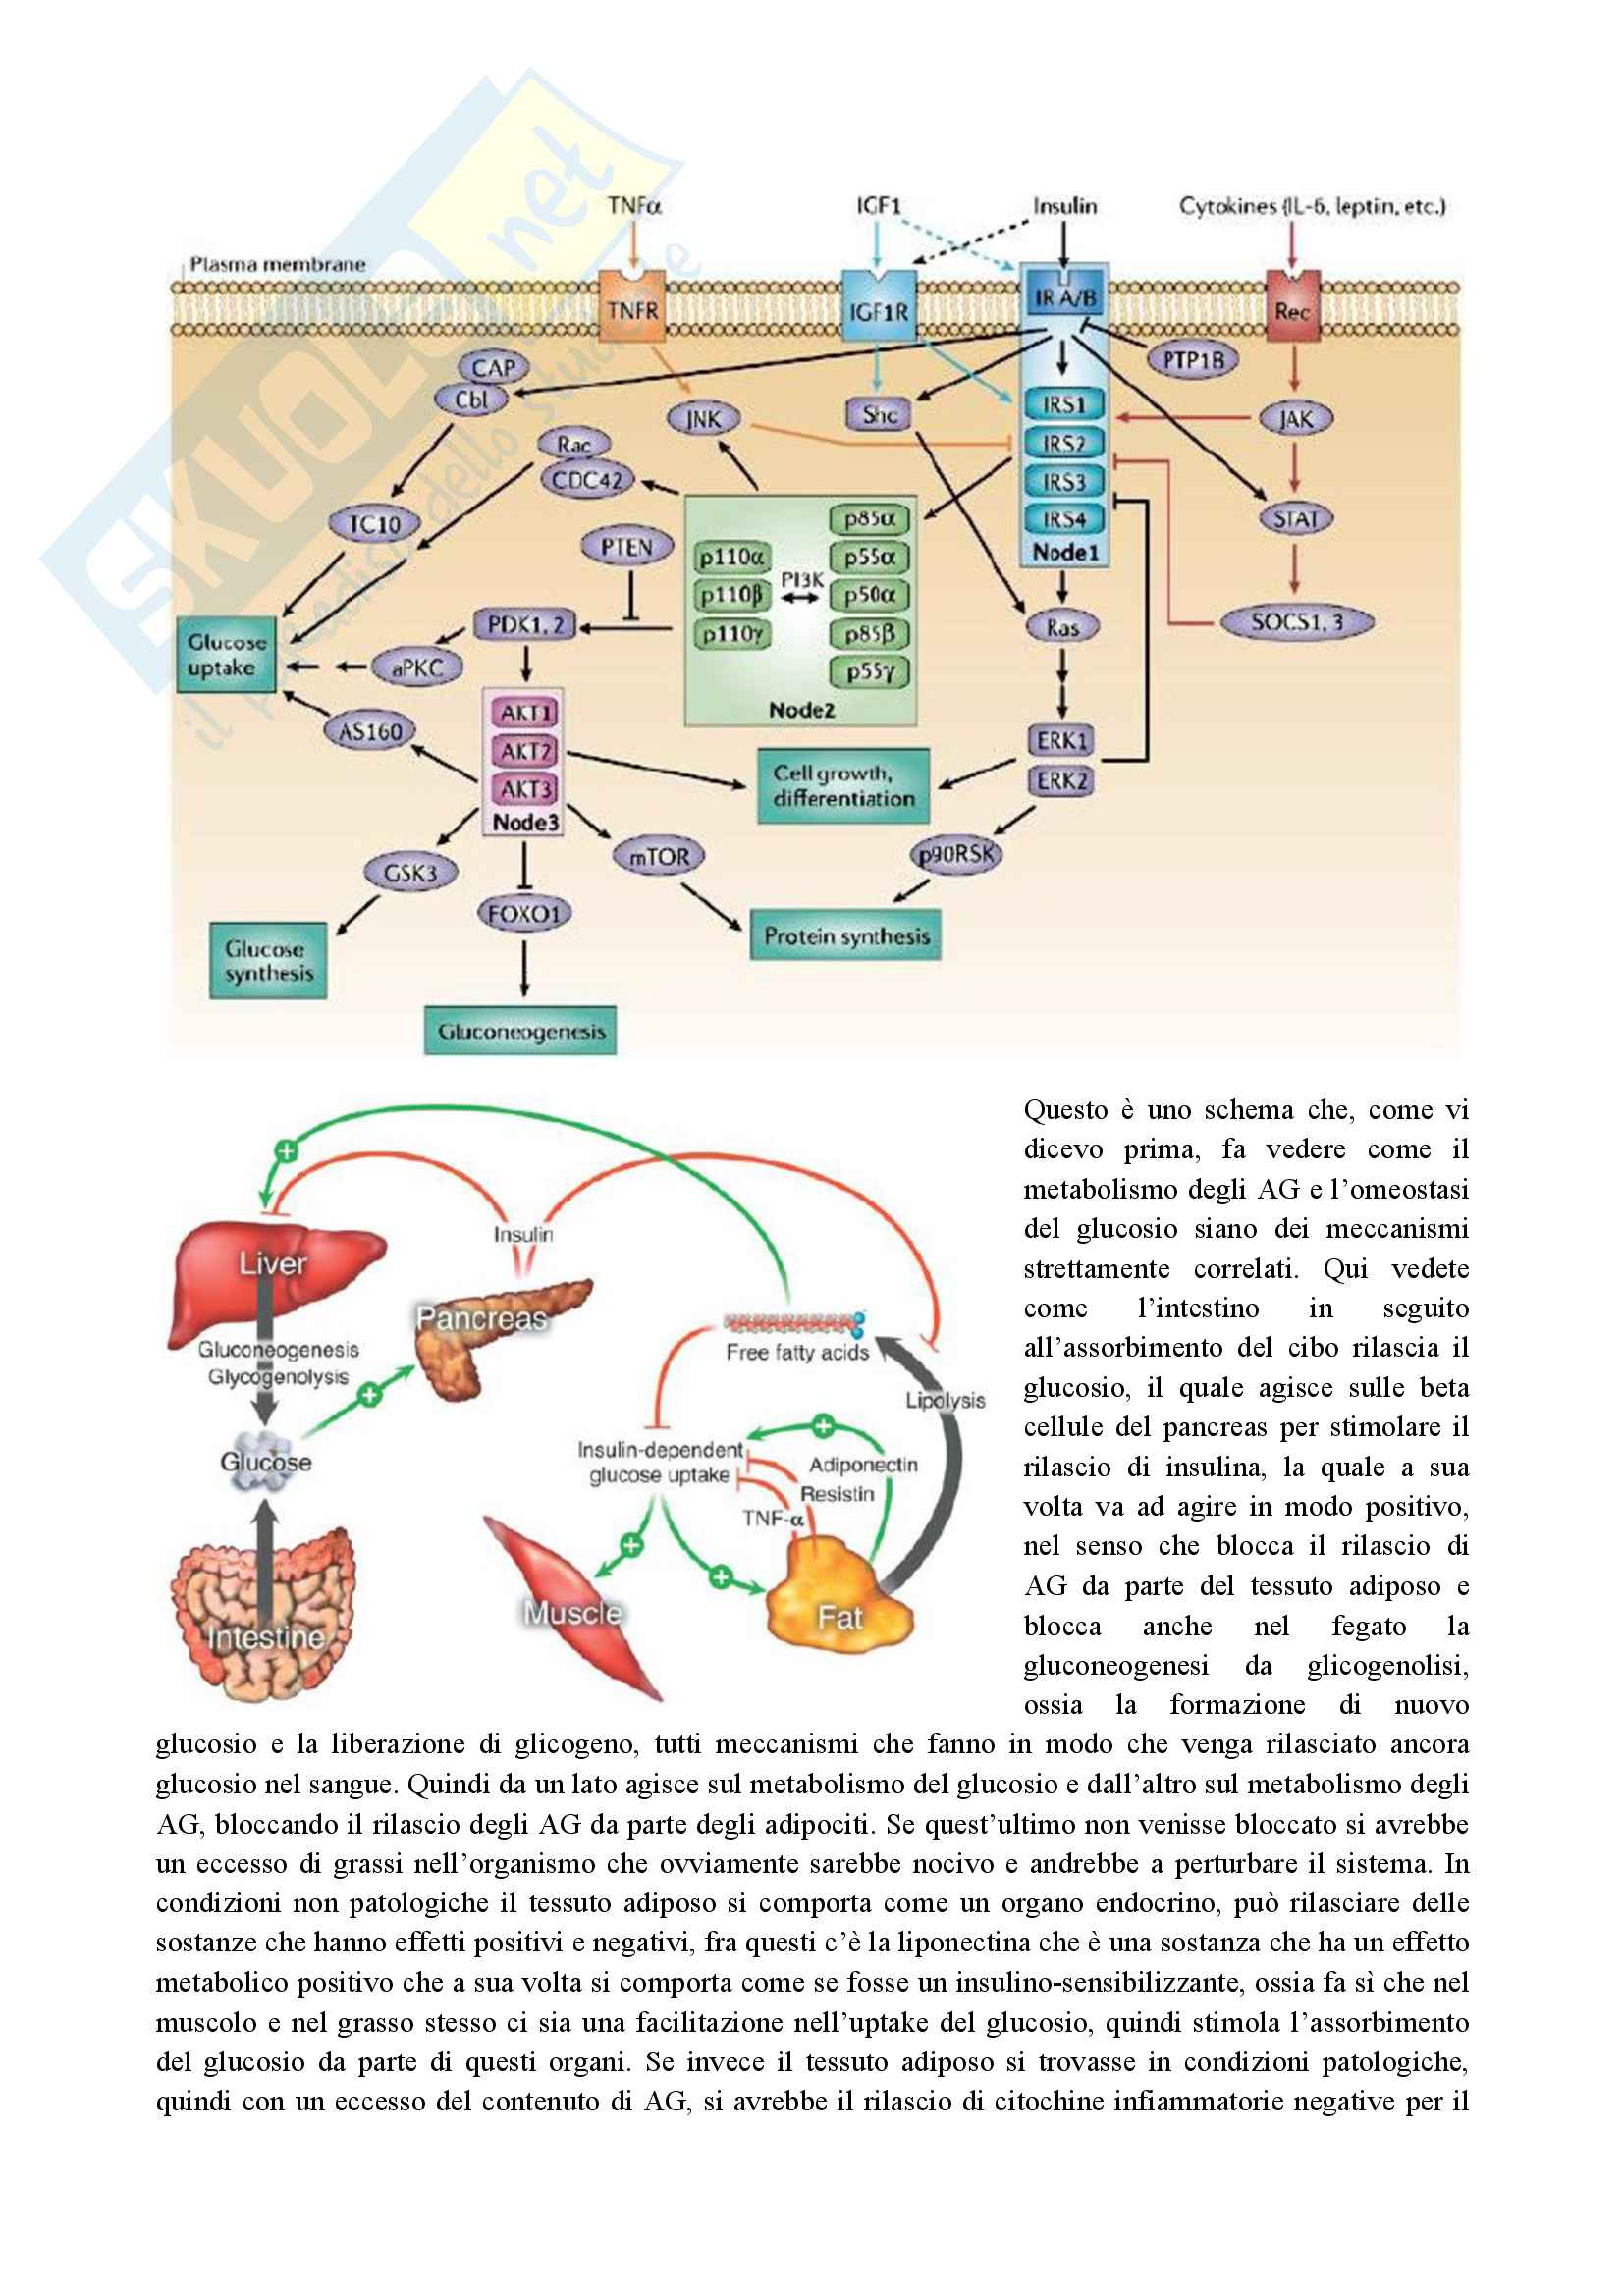 Endocrinologia Granata parte 1 Pag. 21